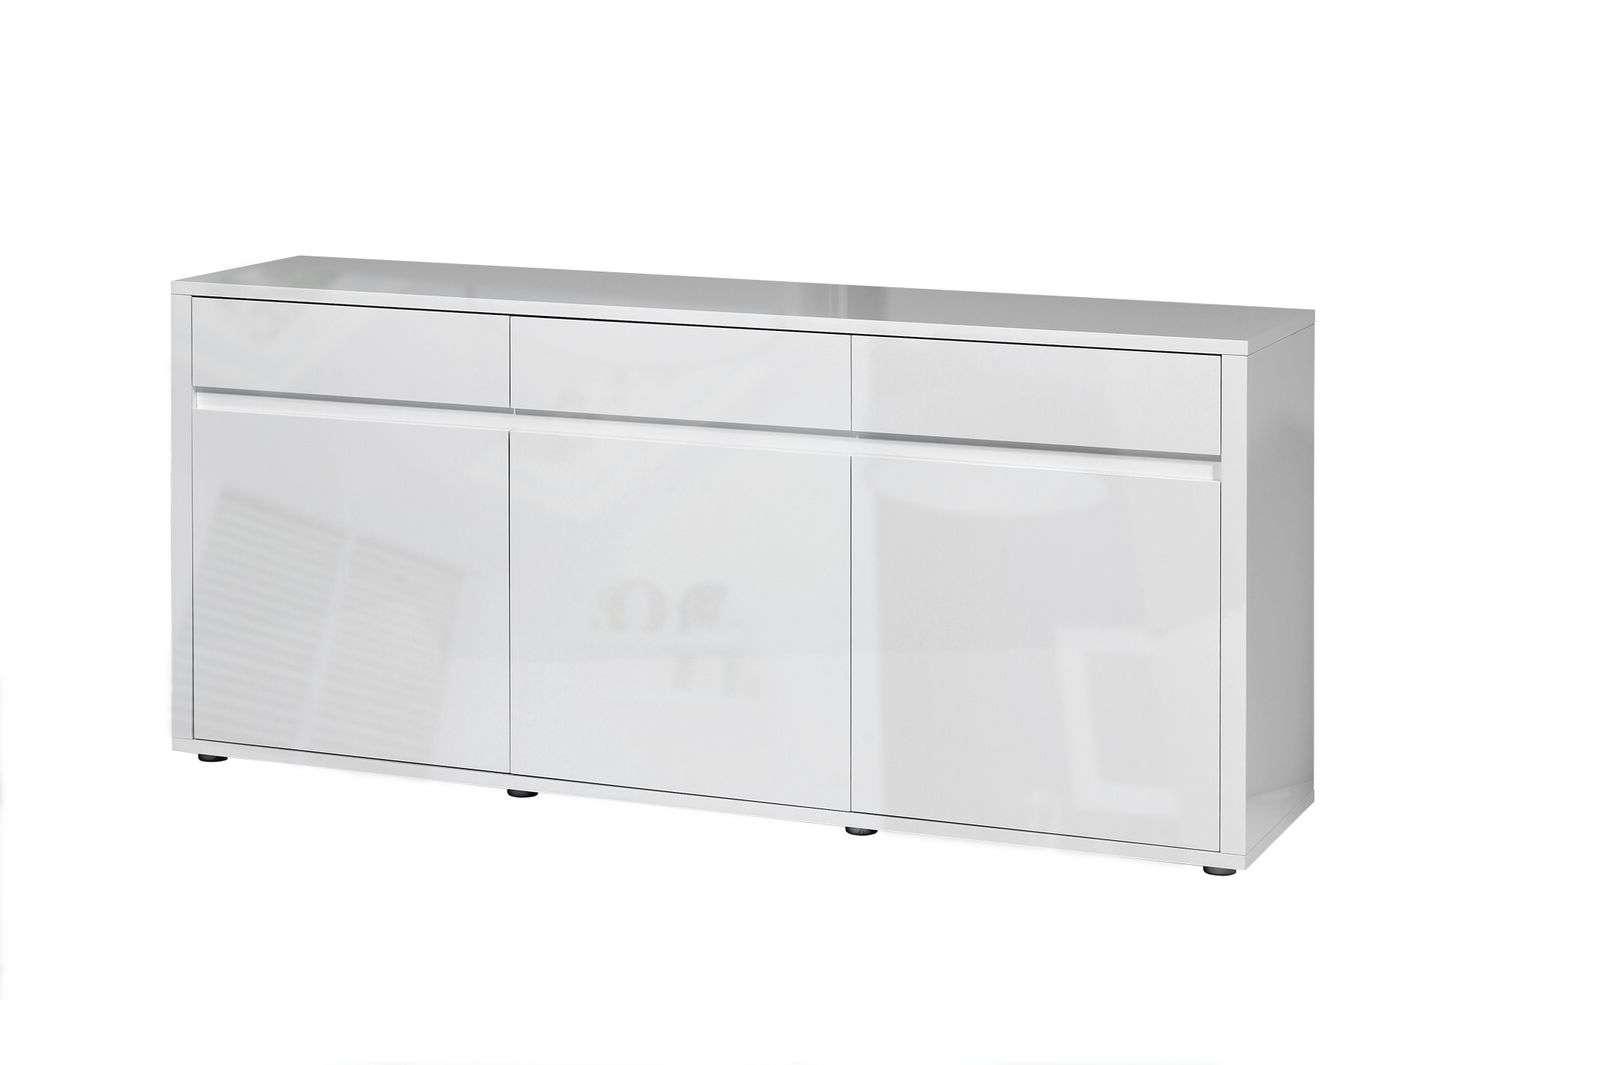 Urbana White High Gloss Sideboard 3 Drawer 3 Door | Fads With White High Gloss Sideboards (View 6 of 20)